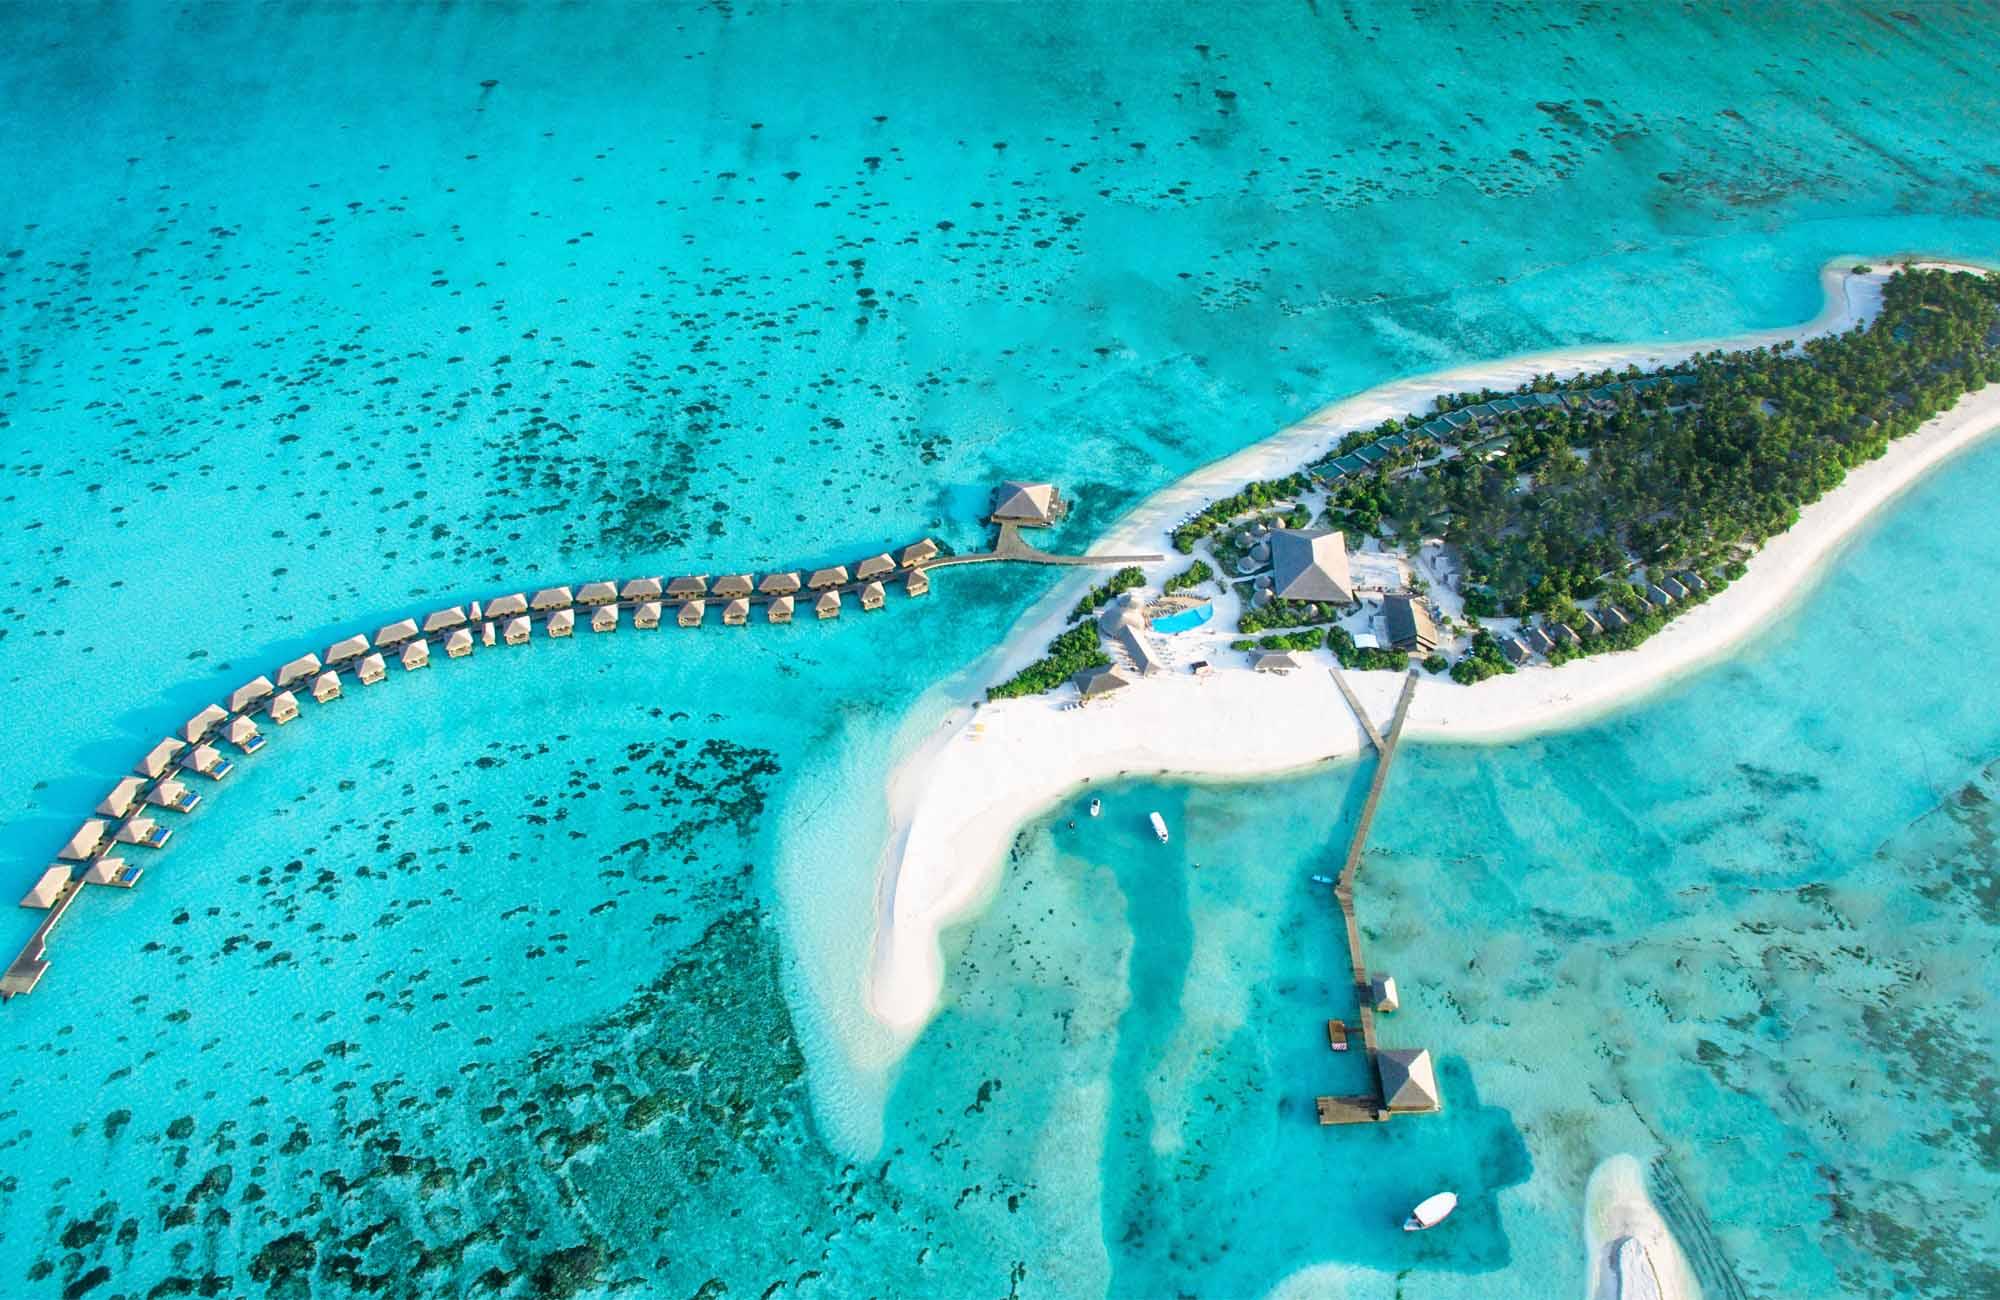 Will Cocoon Maldives score a World Luxury Restaurant Award?